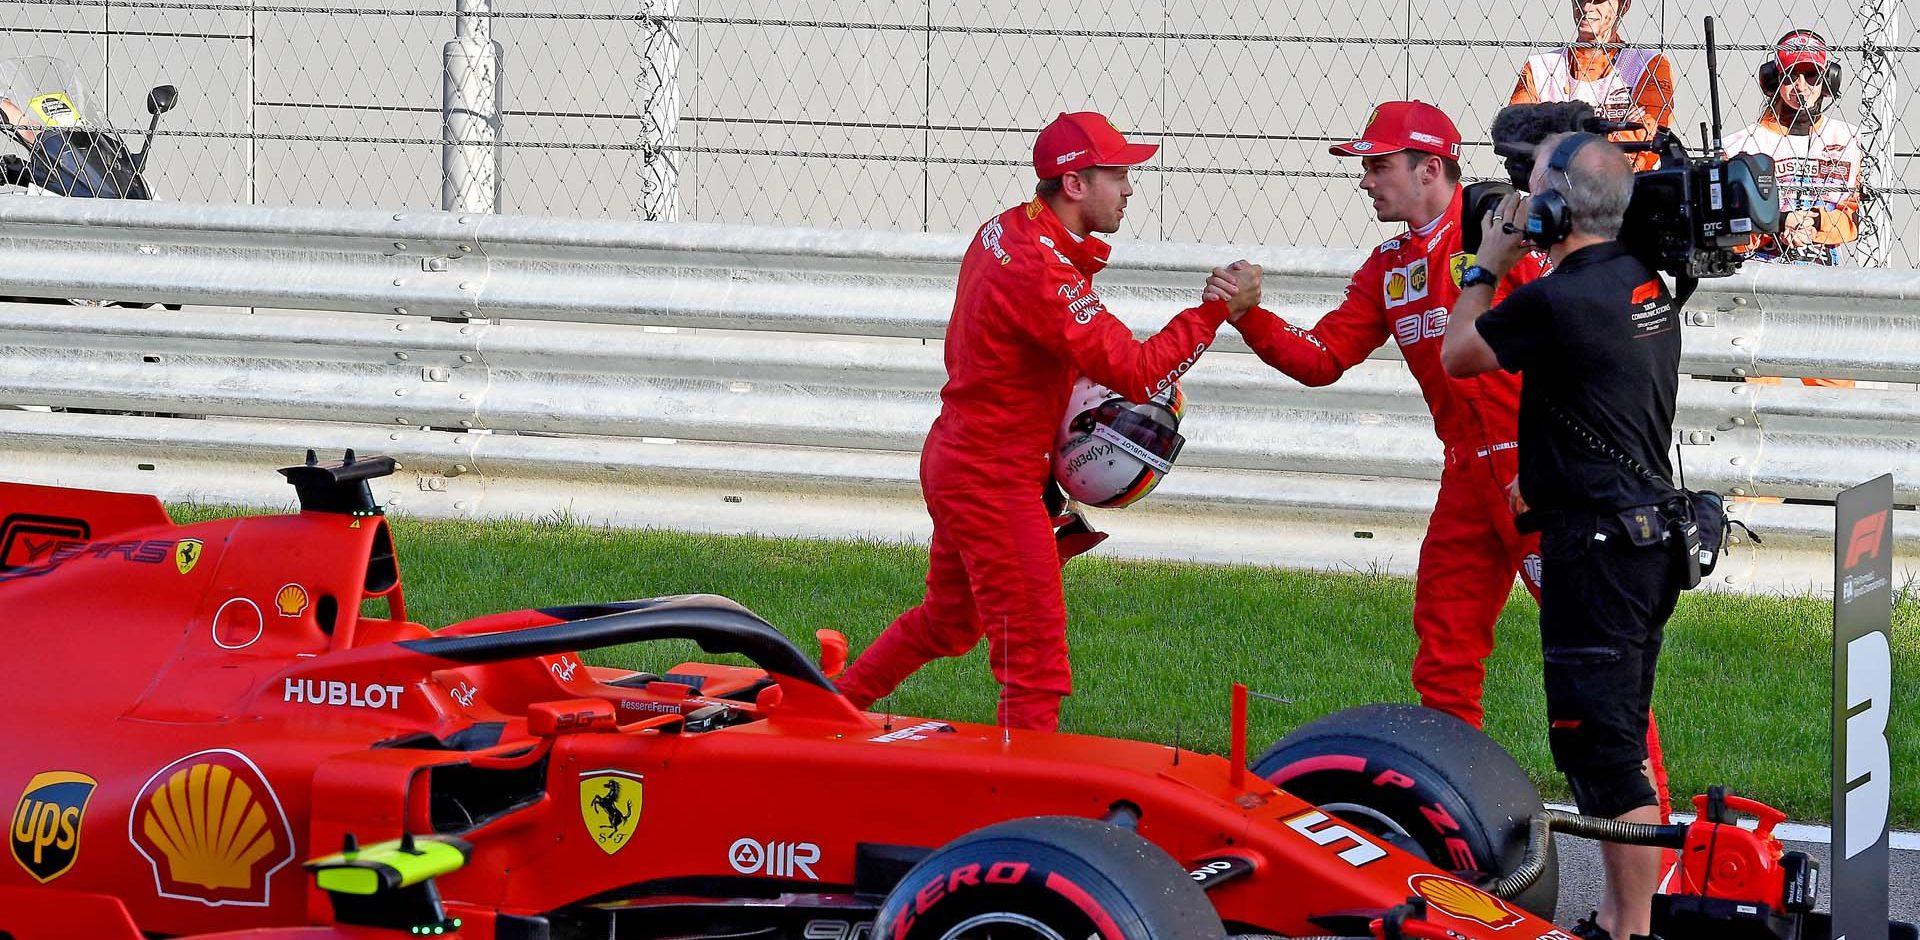 GP RUSSIA F1/2019 -  SABATO  28/09/2019   credit: @Scuderia Ferrari Press Office Charles Leclerc Sebastian Vettel